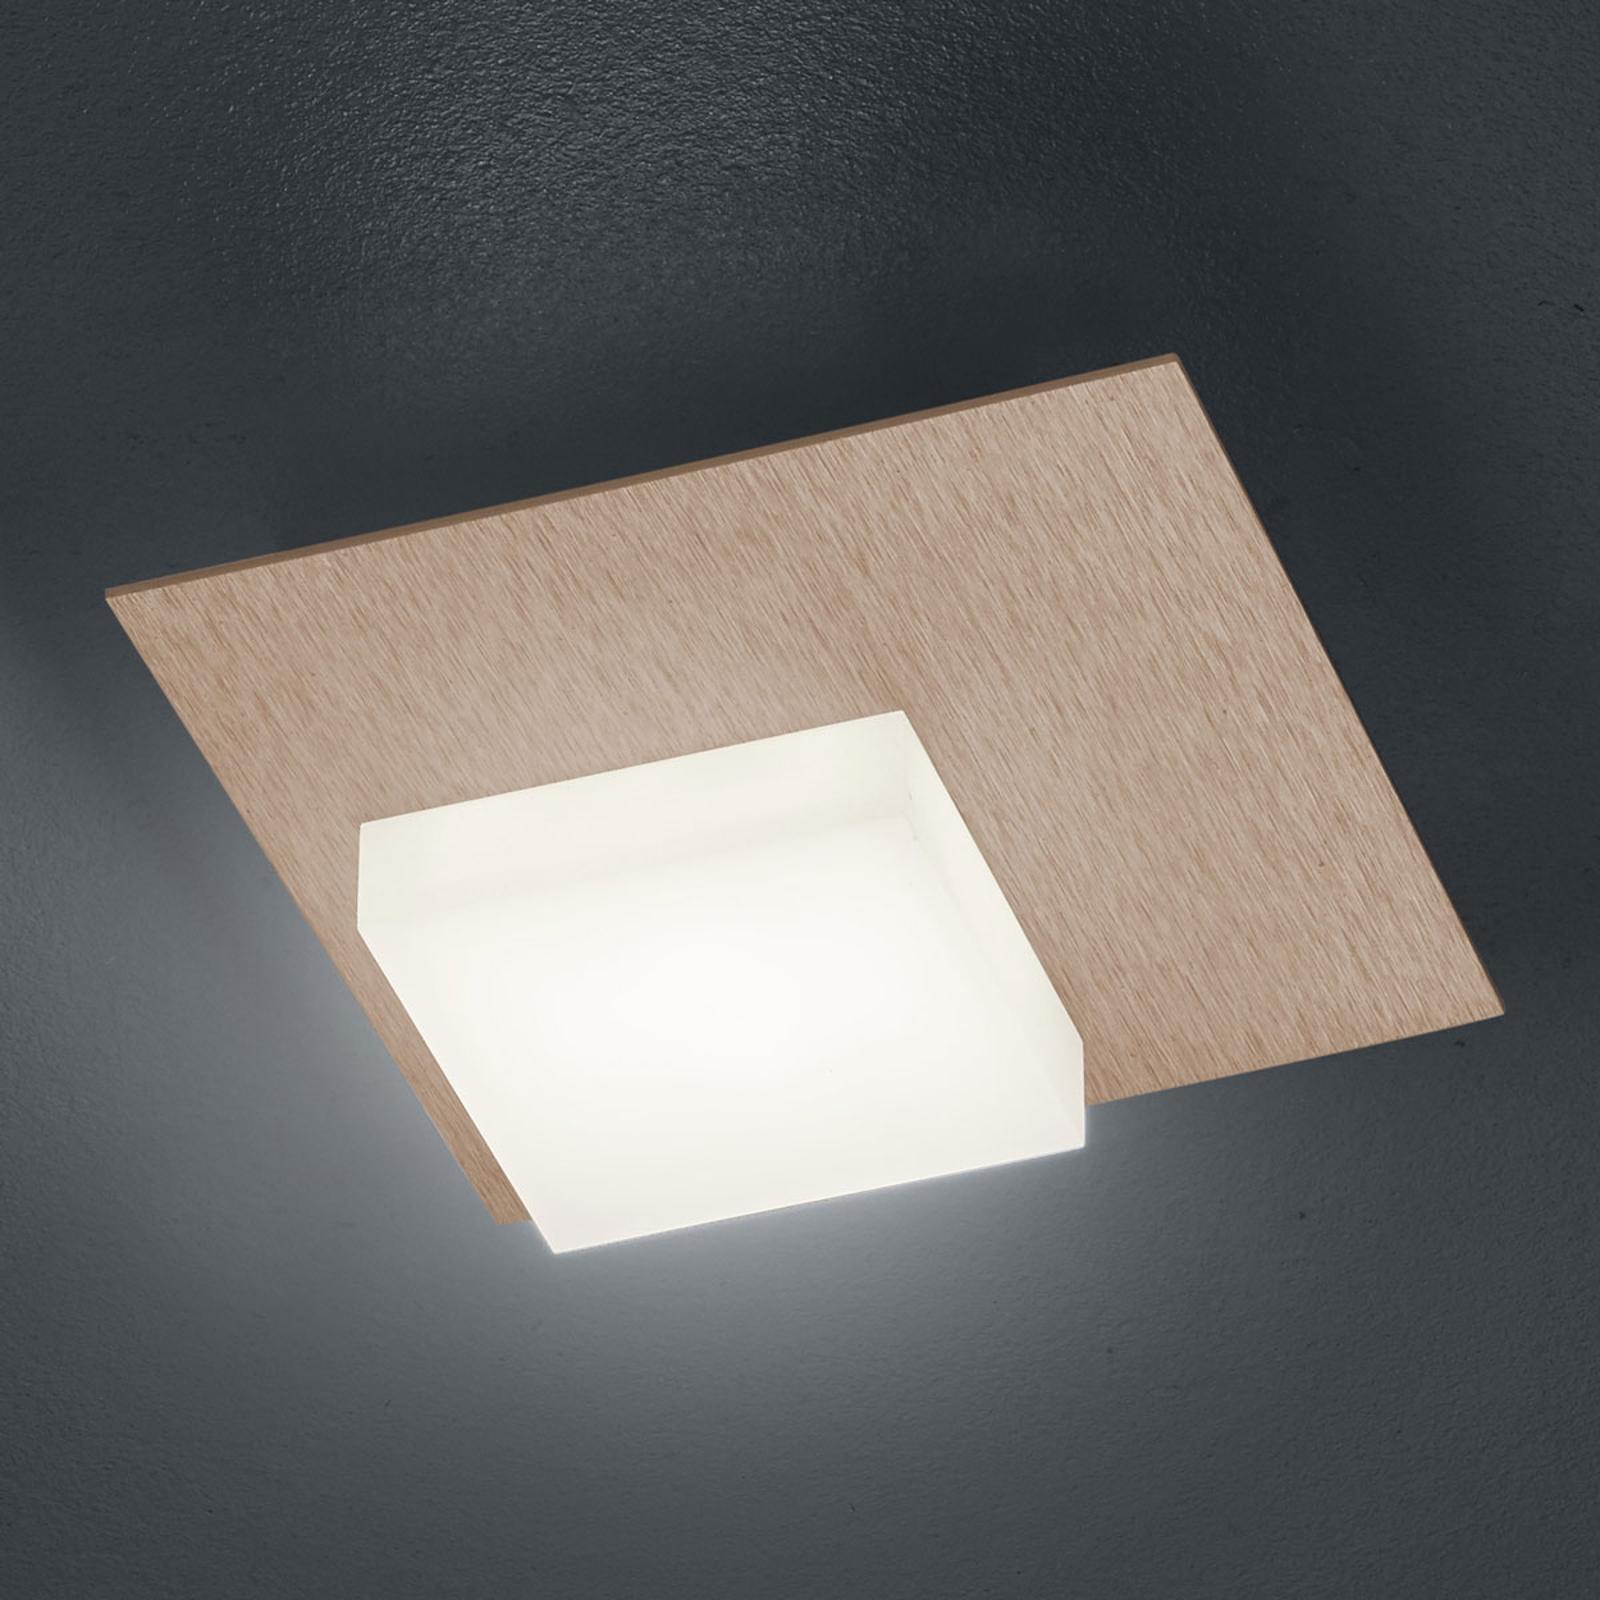 BANKAMP Cube LED-Deckenleuchte 8W, roségold